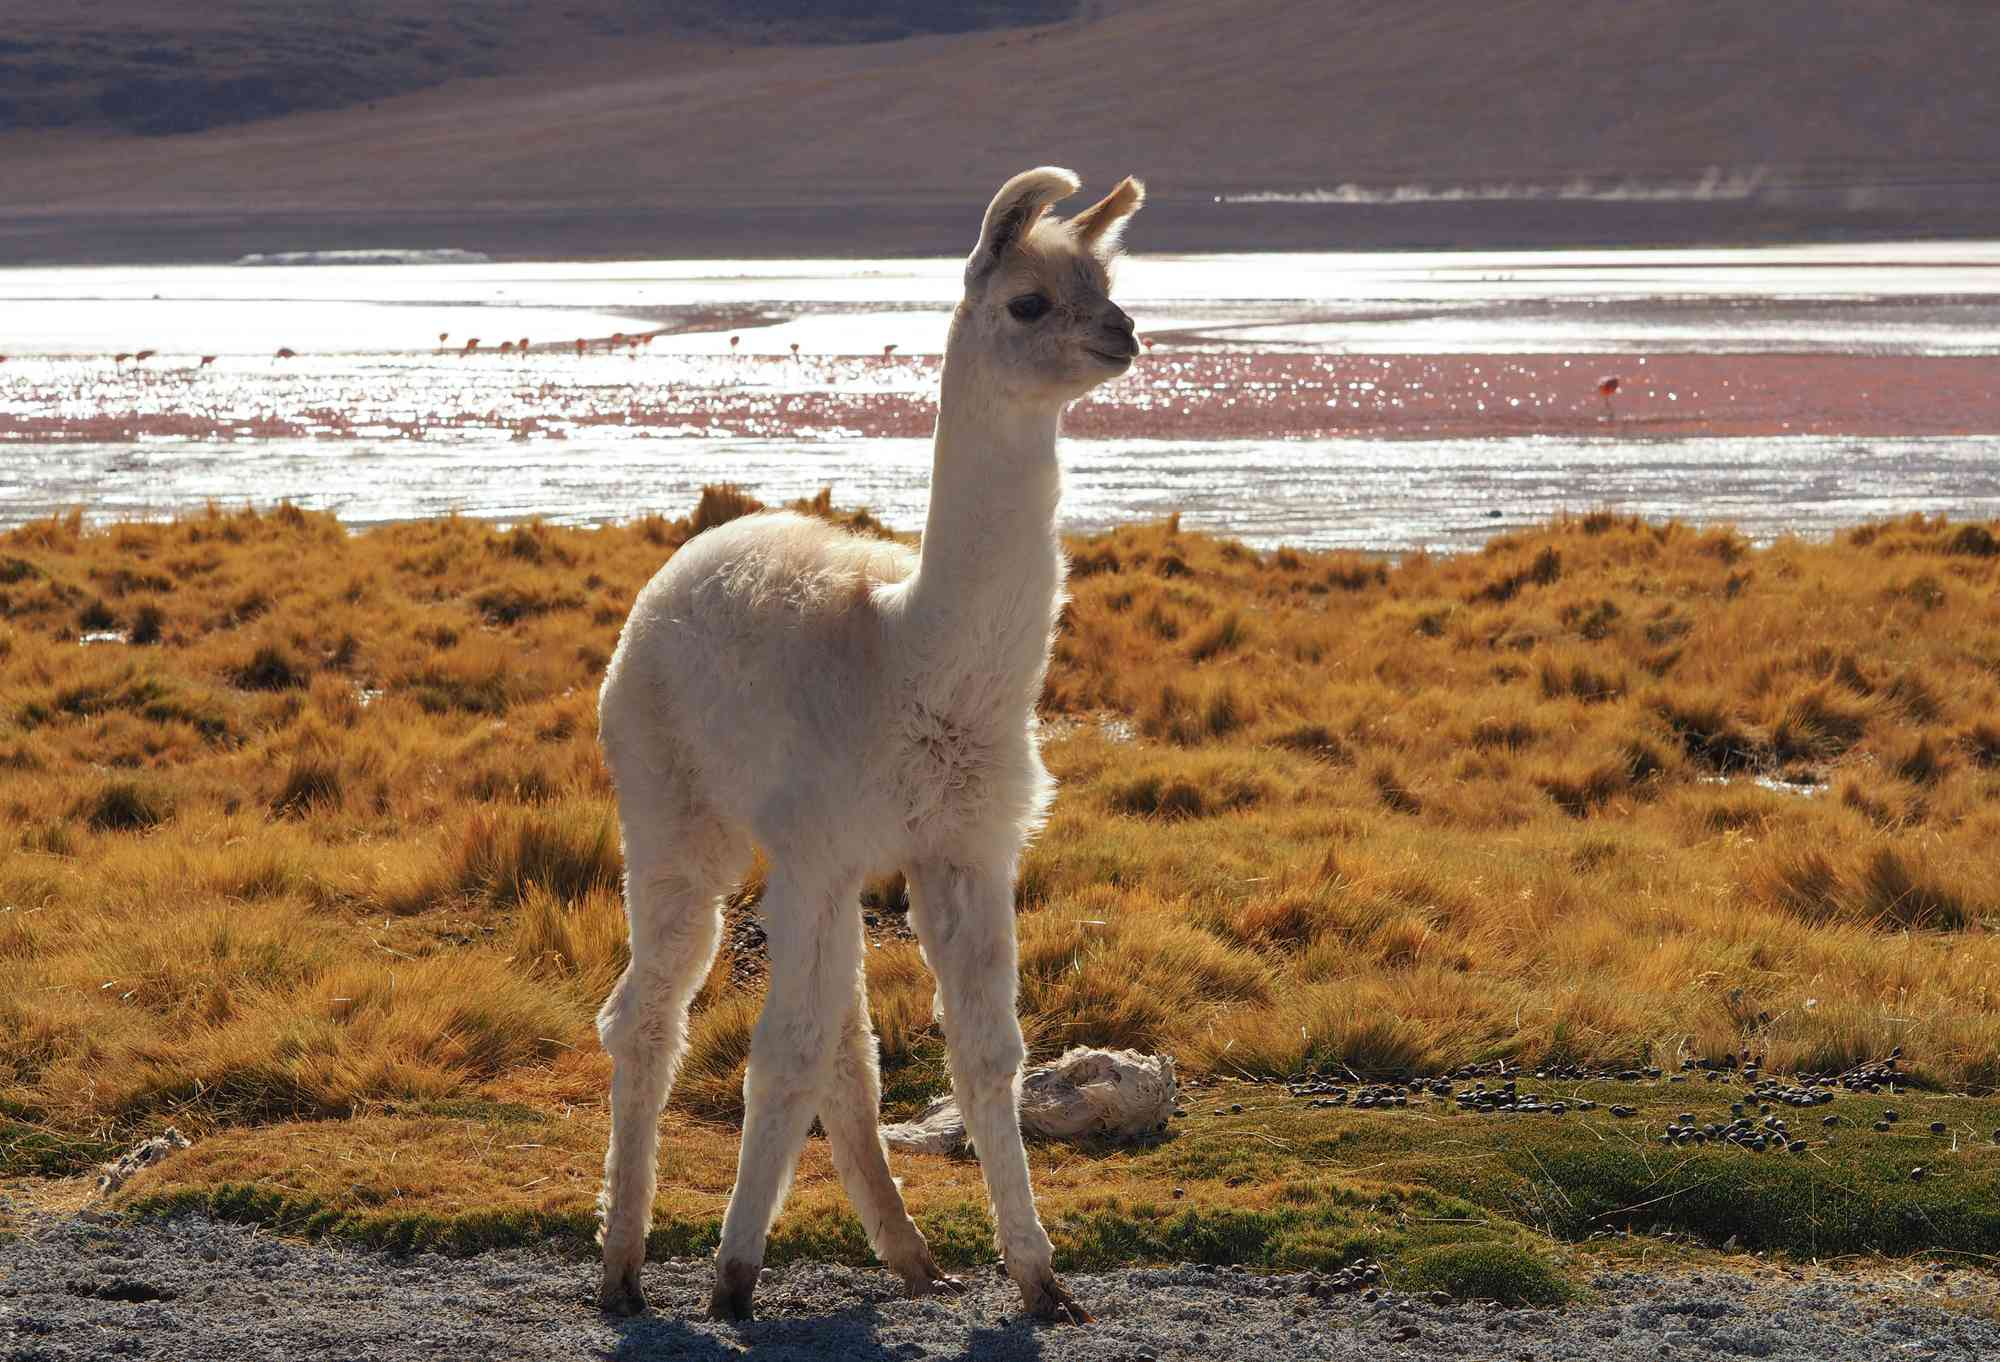 A young alpaca surveys the surroundings at Laguna Colorada, Uyuni, Bolivia.